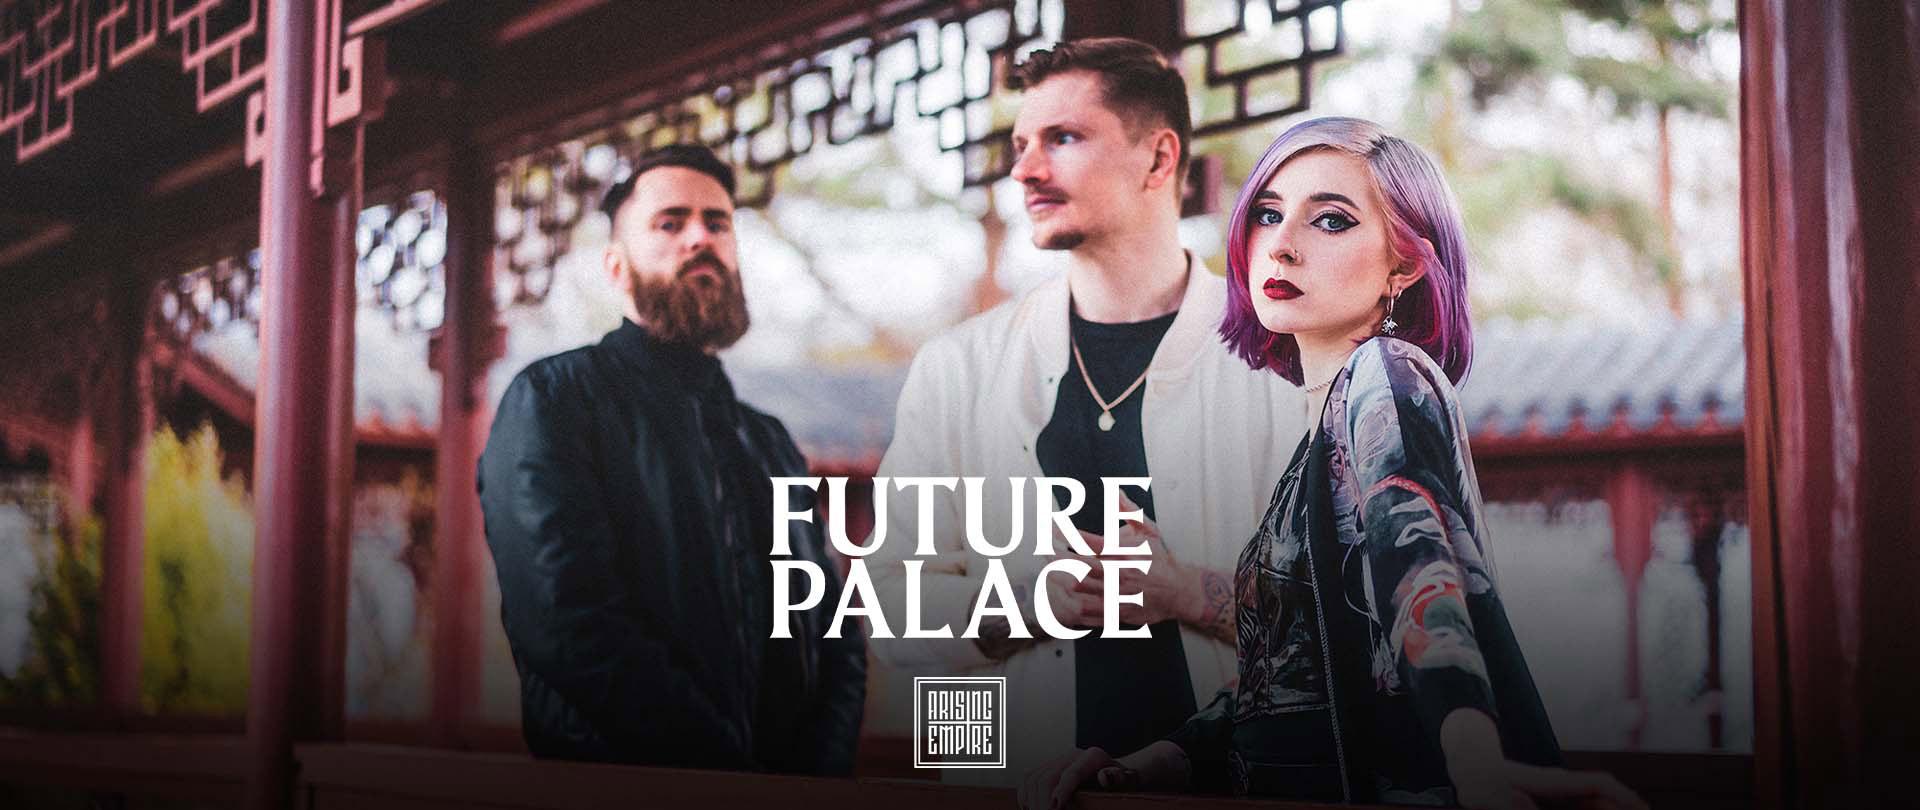 Future Palace at Arising Empire • Offizieller Online Shop